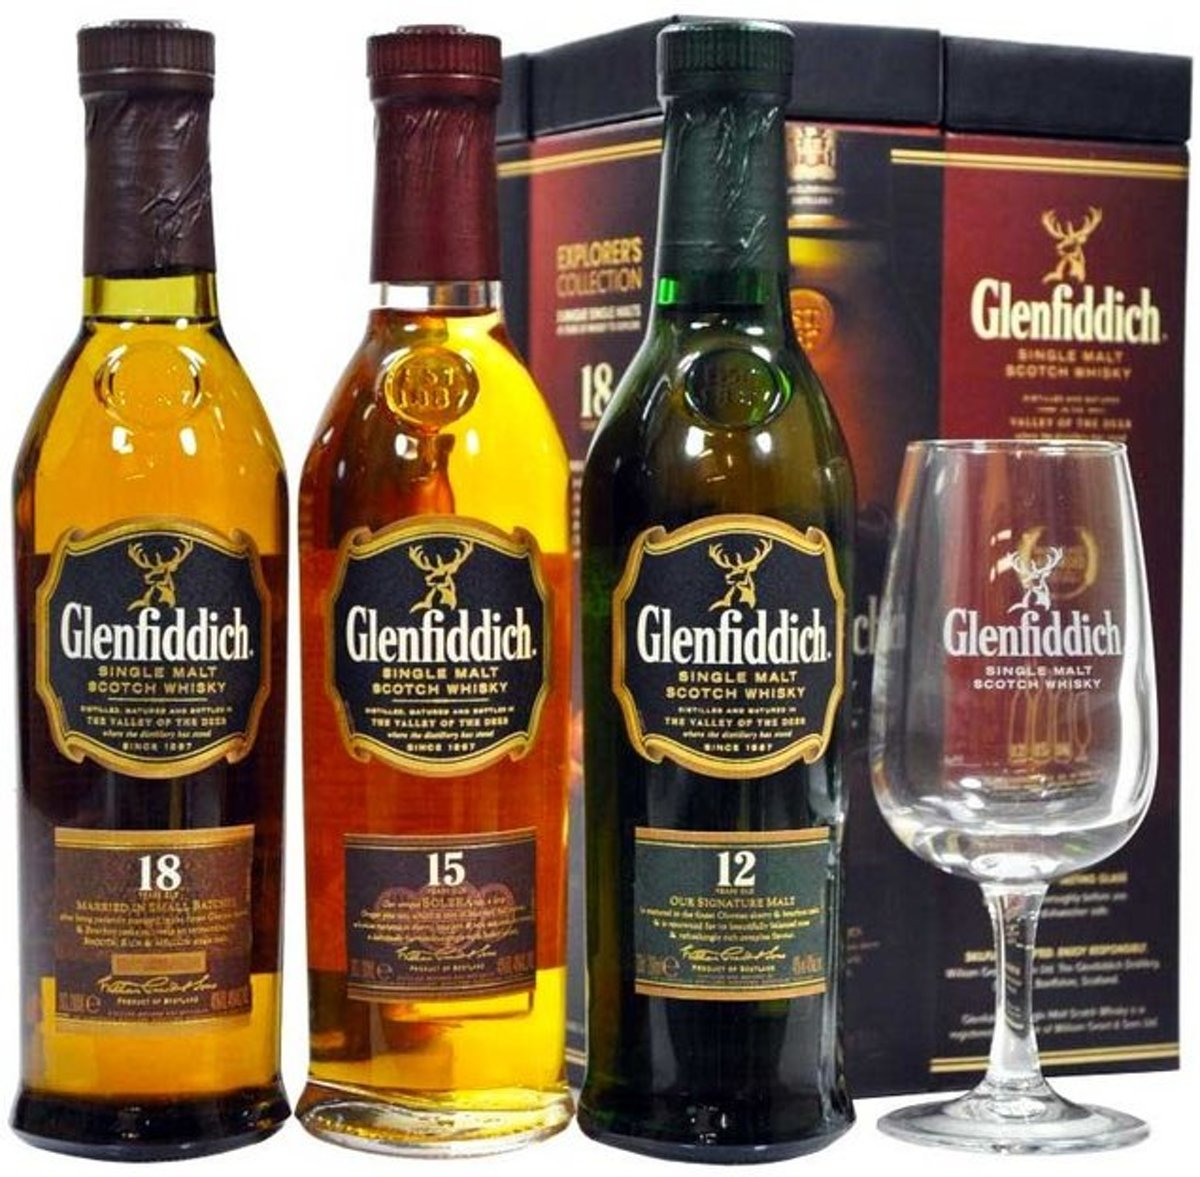 Glenfiddich Scotch Whiskey degustatieglazen 6st 12cl kopen